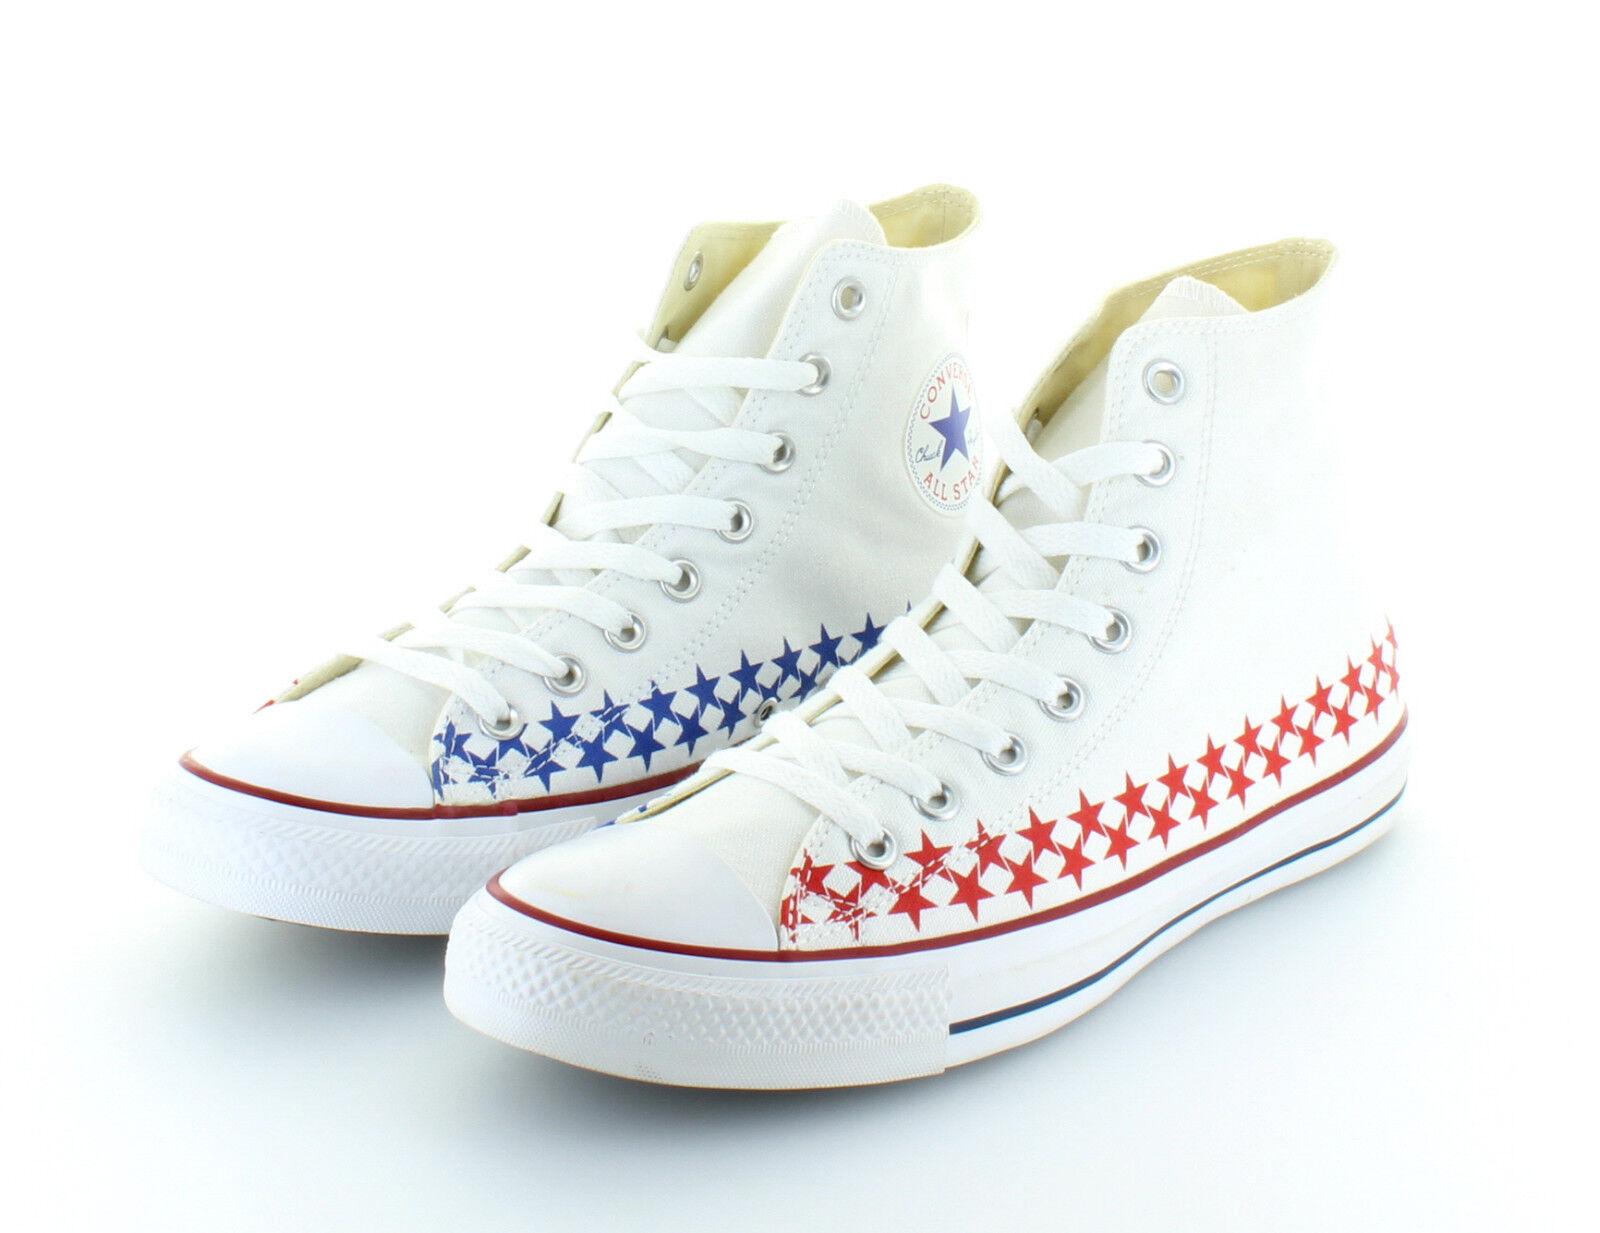 Converse Chuck Taylor All Star Hi Americana Limited Edition Gr. 42,5 / 43,5